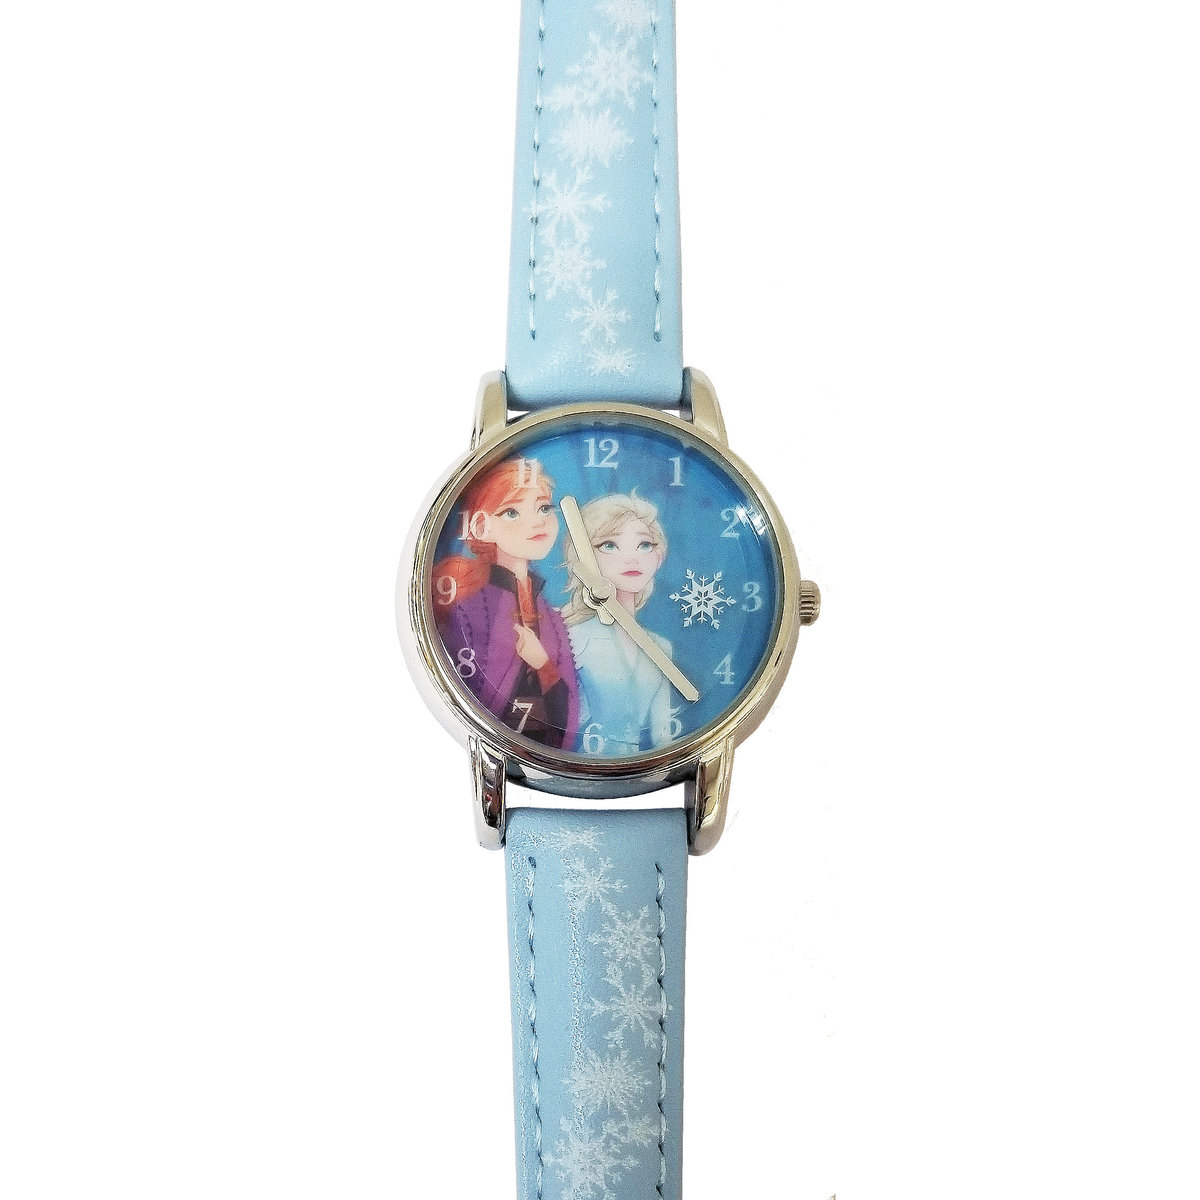 DISNEY FROZEN 2 - Moving disc wrist watch - Elsa/Anna (Licensed by Disney)